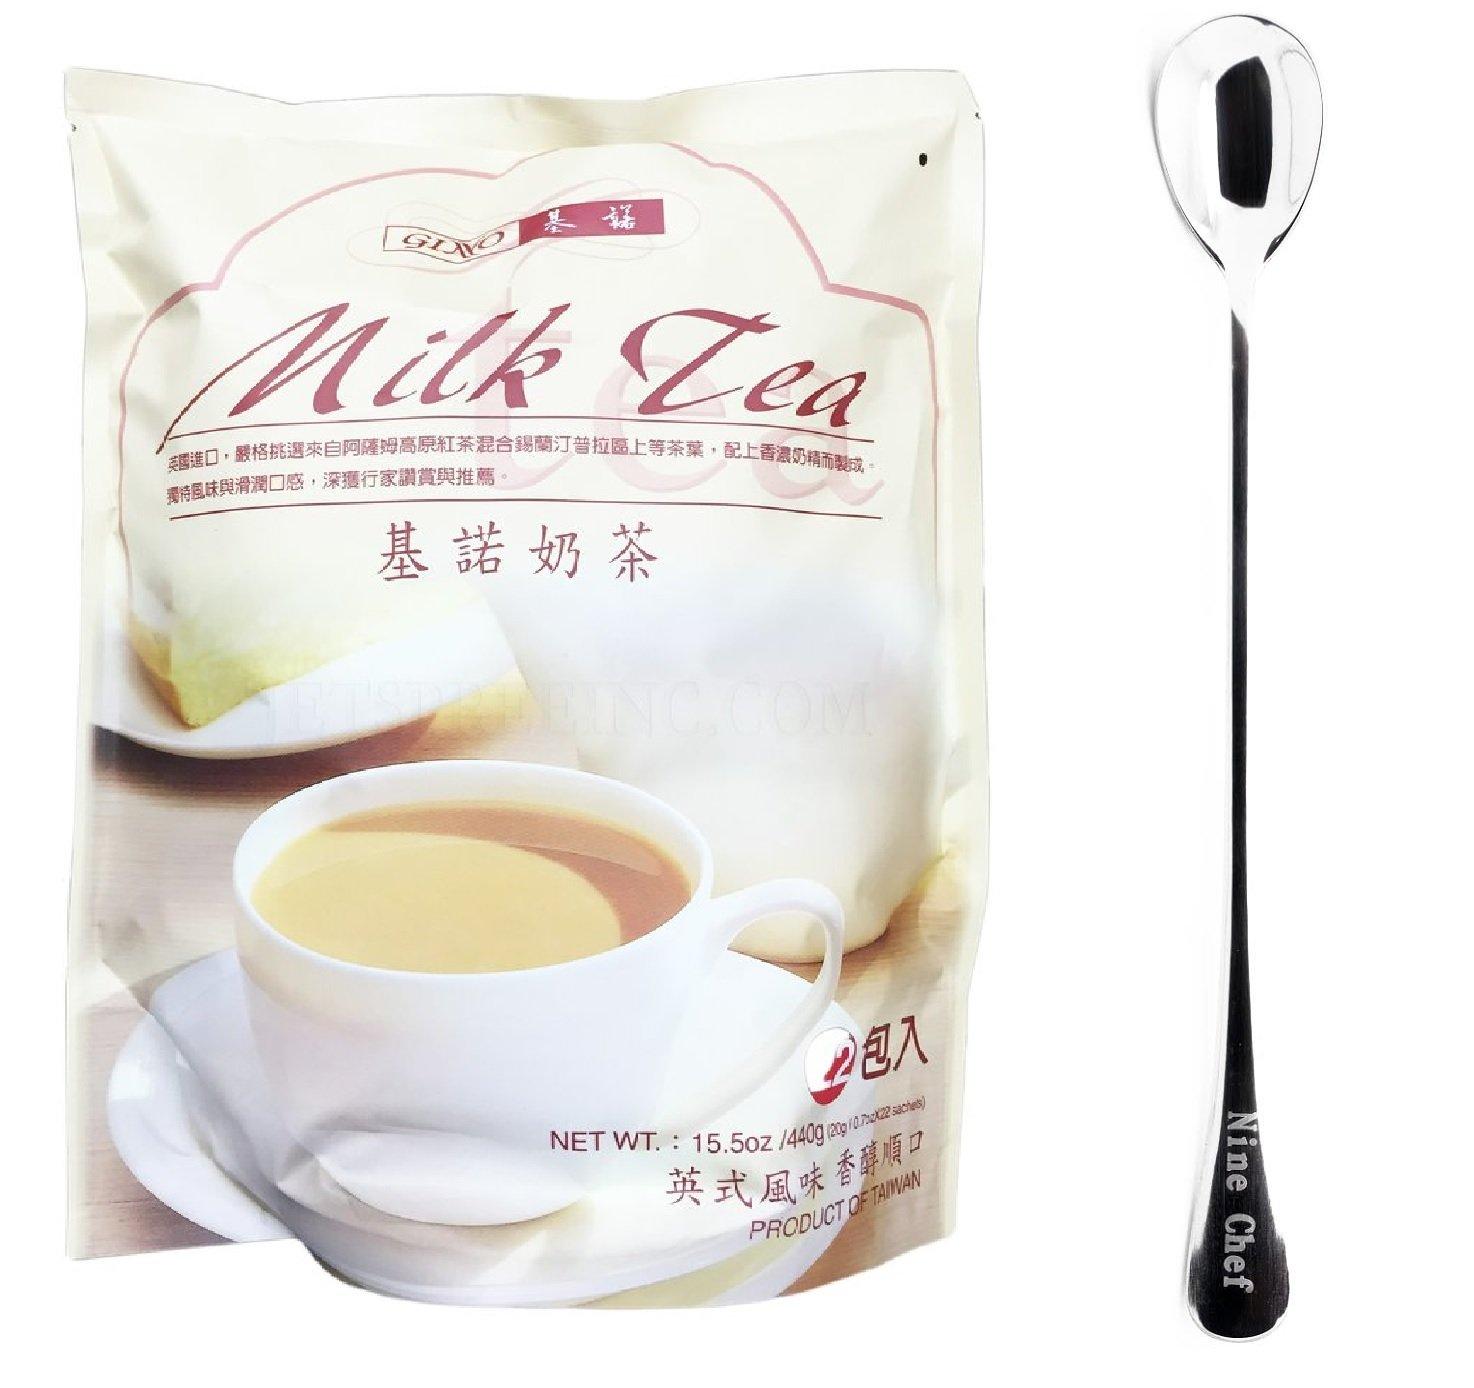 Gino Cafe Milk Tea(5 Bag) + One NineChef Coffee Spoon by Gino